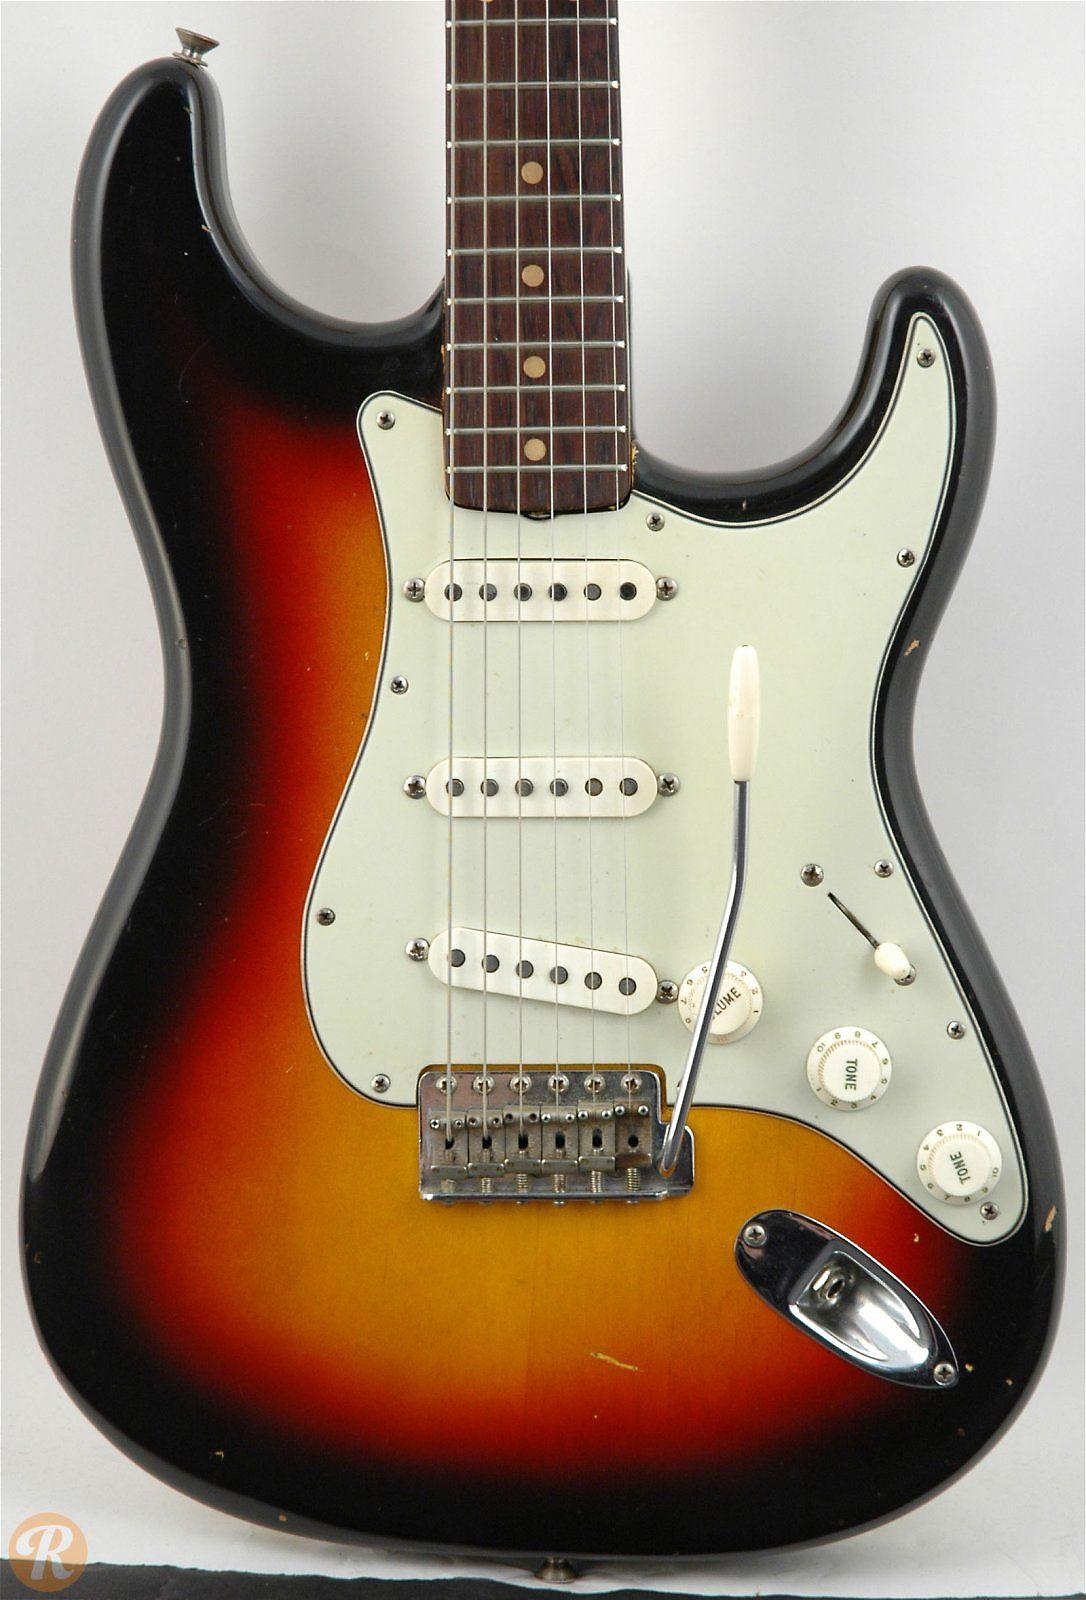 62 Auto Sales >> Fender Stratocaster Sunburst 1962 | Reverb